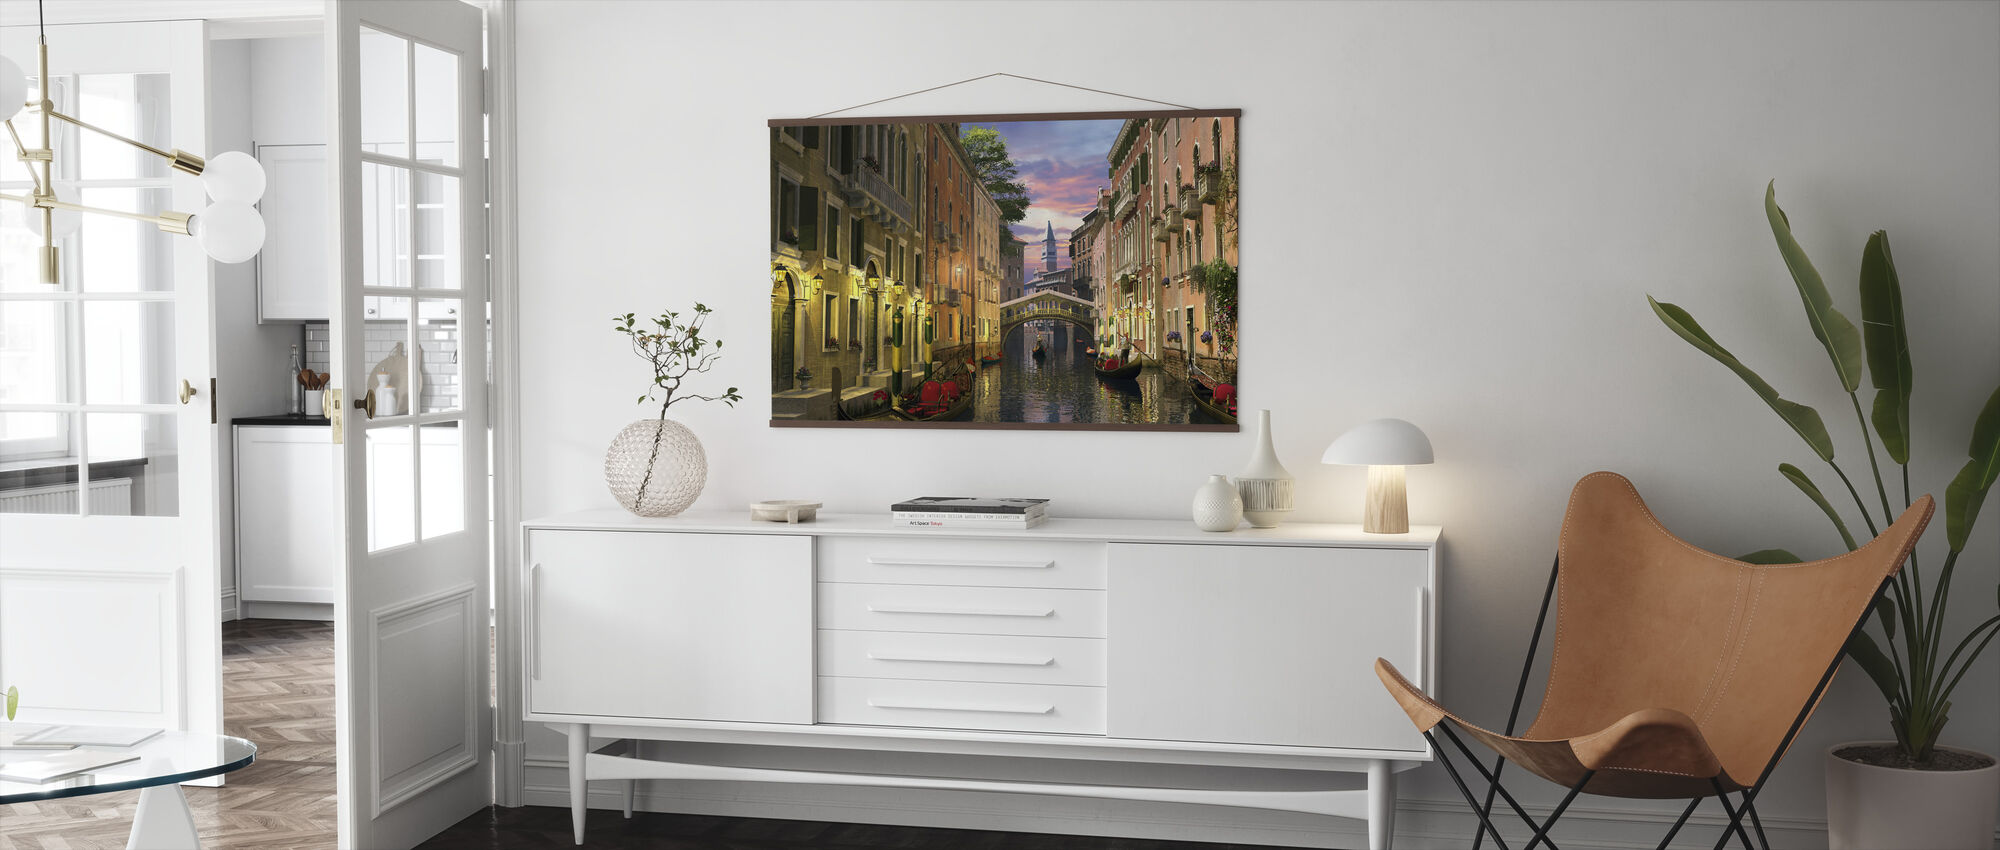 Venice at Dusk - Poster - Living Room